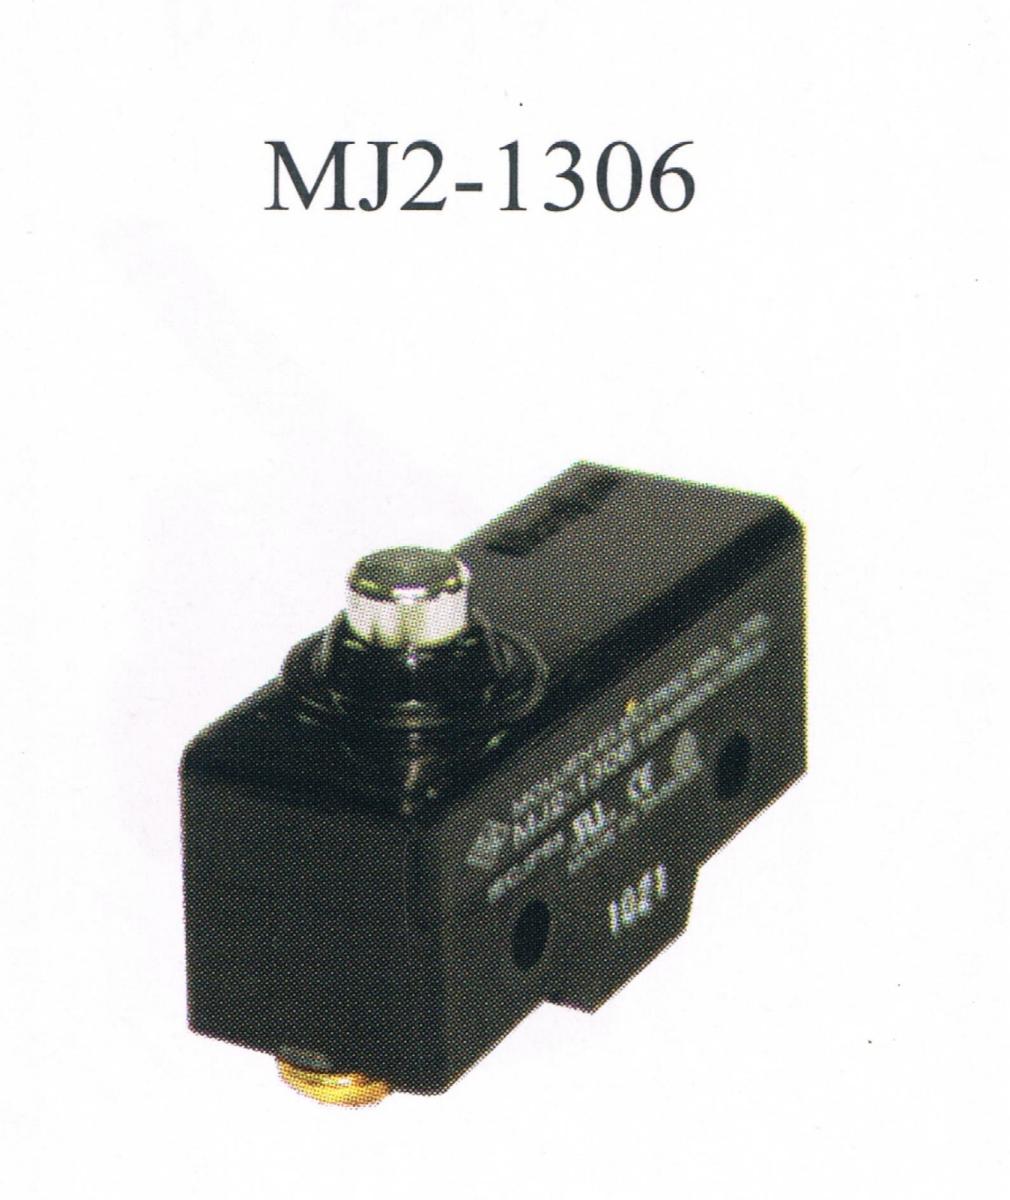 MOUJEN MJ2-1306 Micro Switch MOUJEN TAIWAN LIMIT SWITCH  Limit Control Switch Johor Bahru (JB), Johor, Ulu Tiram, Malaysia Supplier, Suppliers, Supply, Supplies   Intech Electric Sdn Bhd